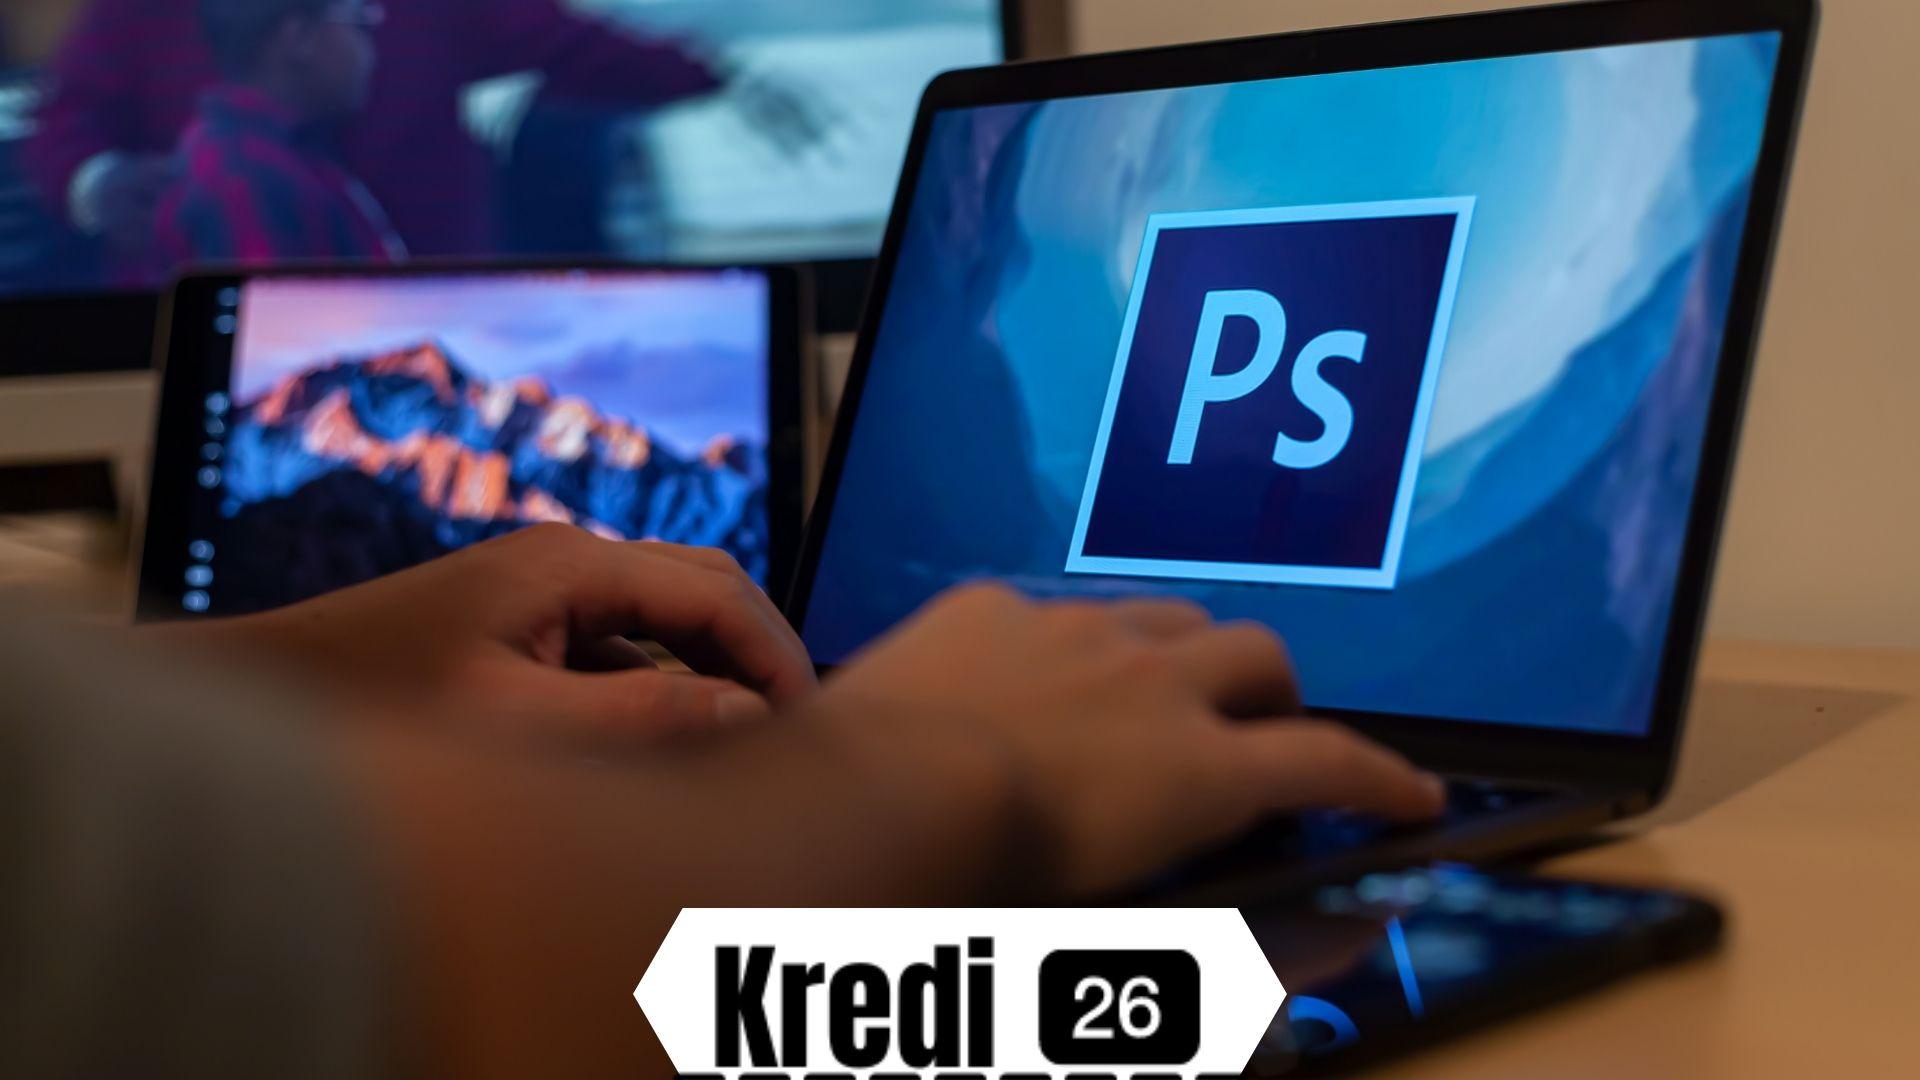 Ücretsiz Photoshop